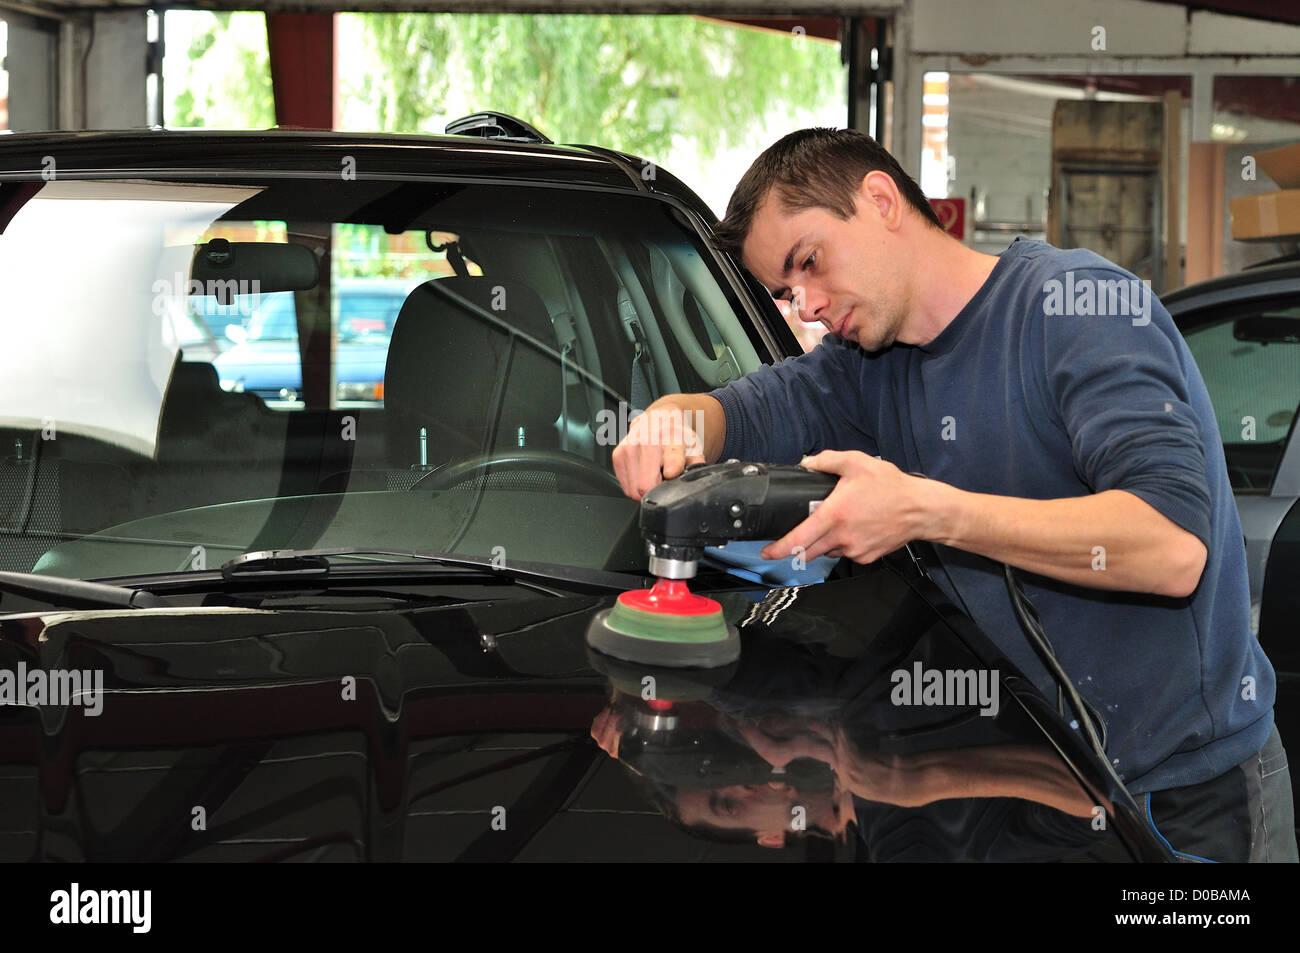 Polishing a black bonnet. - Stock Image